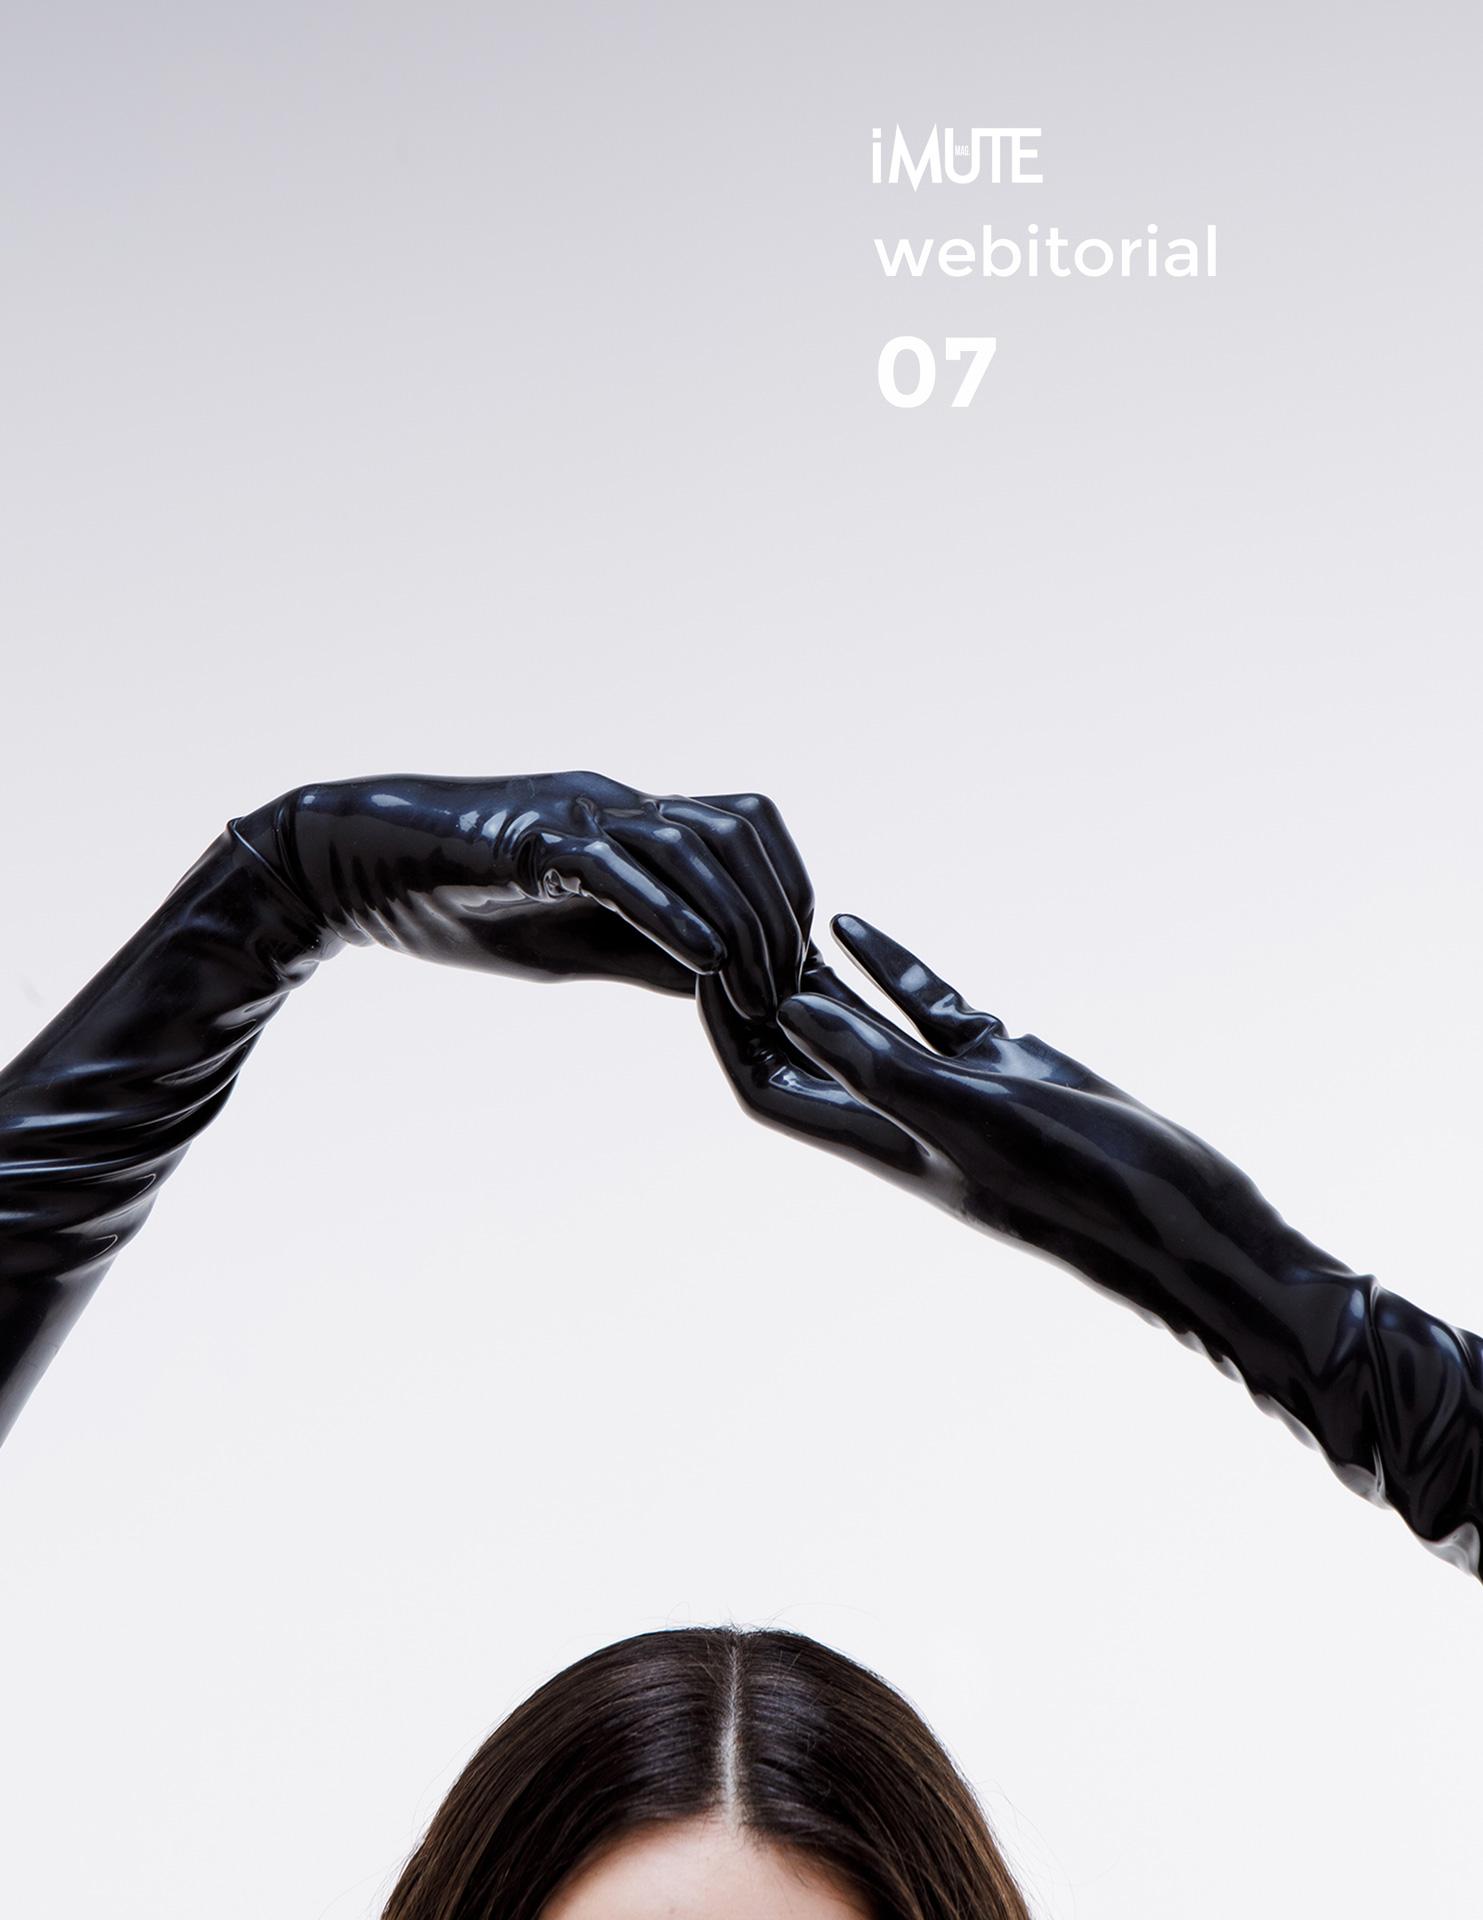 CUT THE WORLD webitorial for iMute Magazine Photographer|Christine Lutz Model| Sophie Schwinn @Model-management Stylist / Makeup & Hair| Nana Thelen Stylist Assistant| Franka Bahr Bts Video|Marius Geugelin